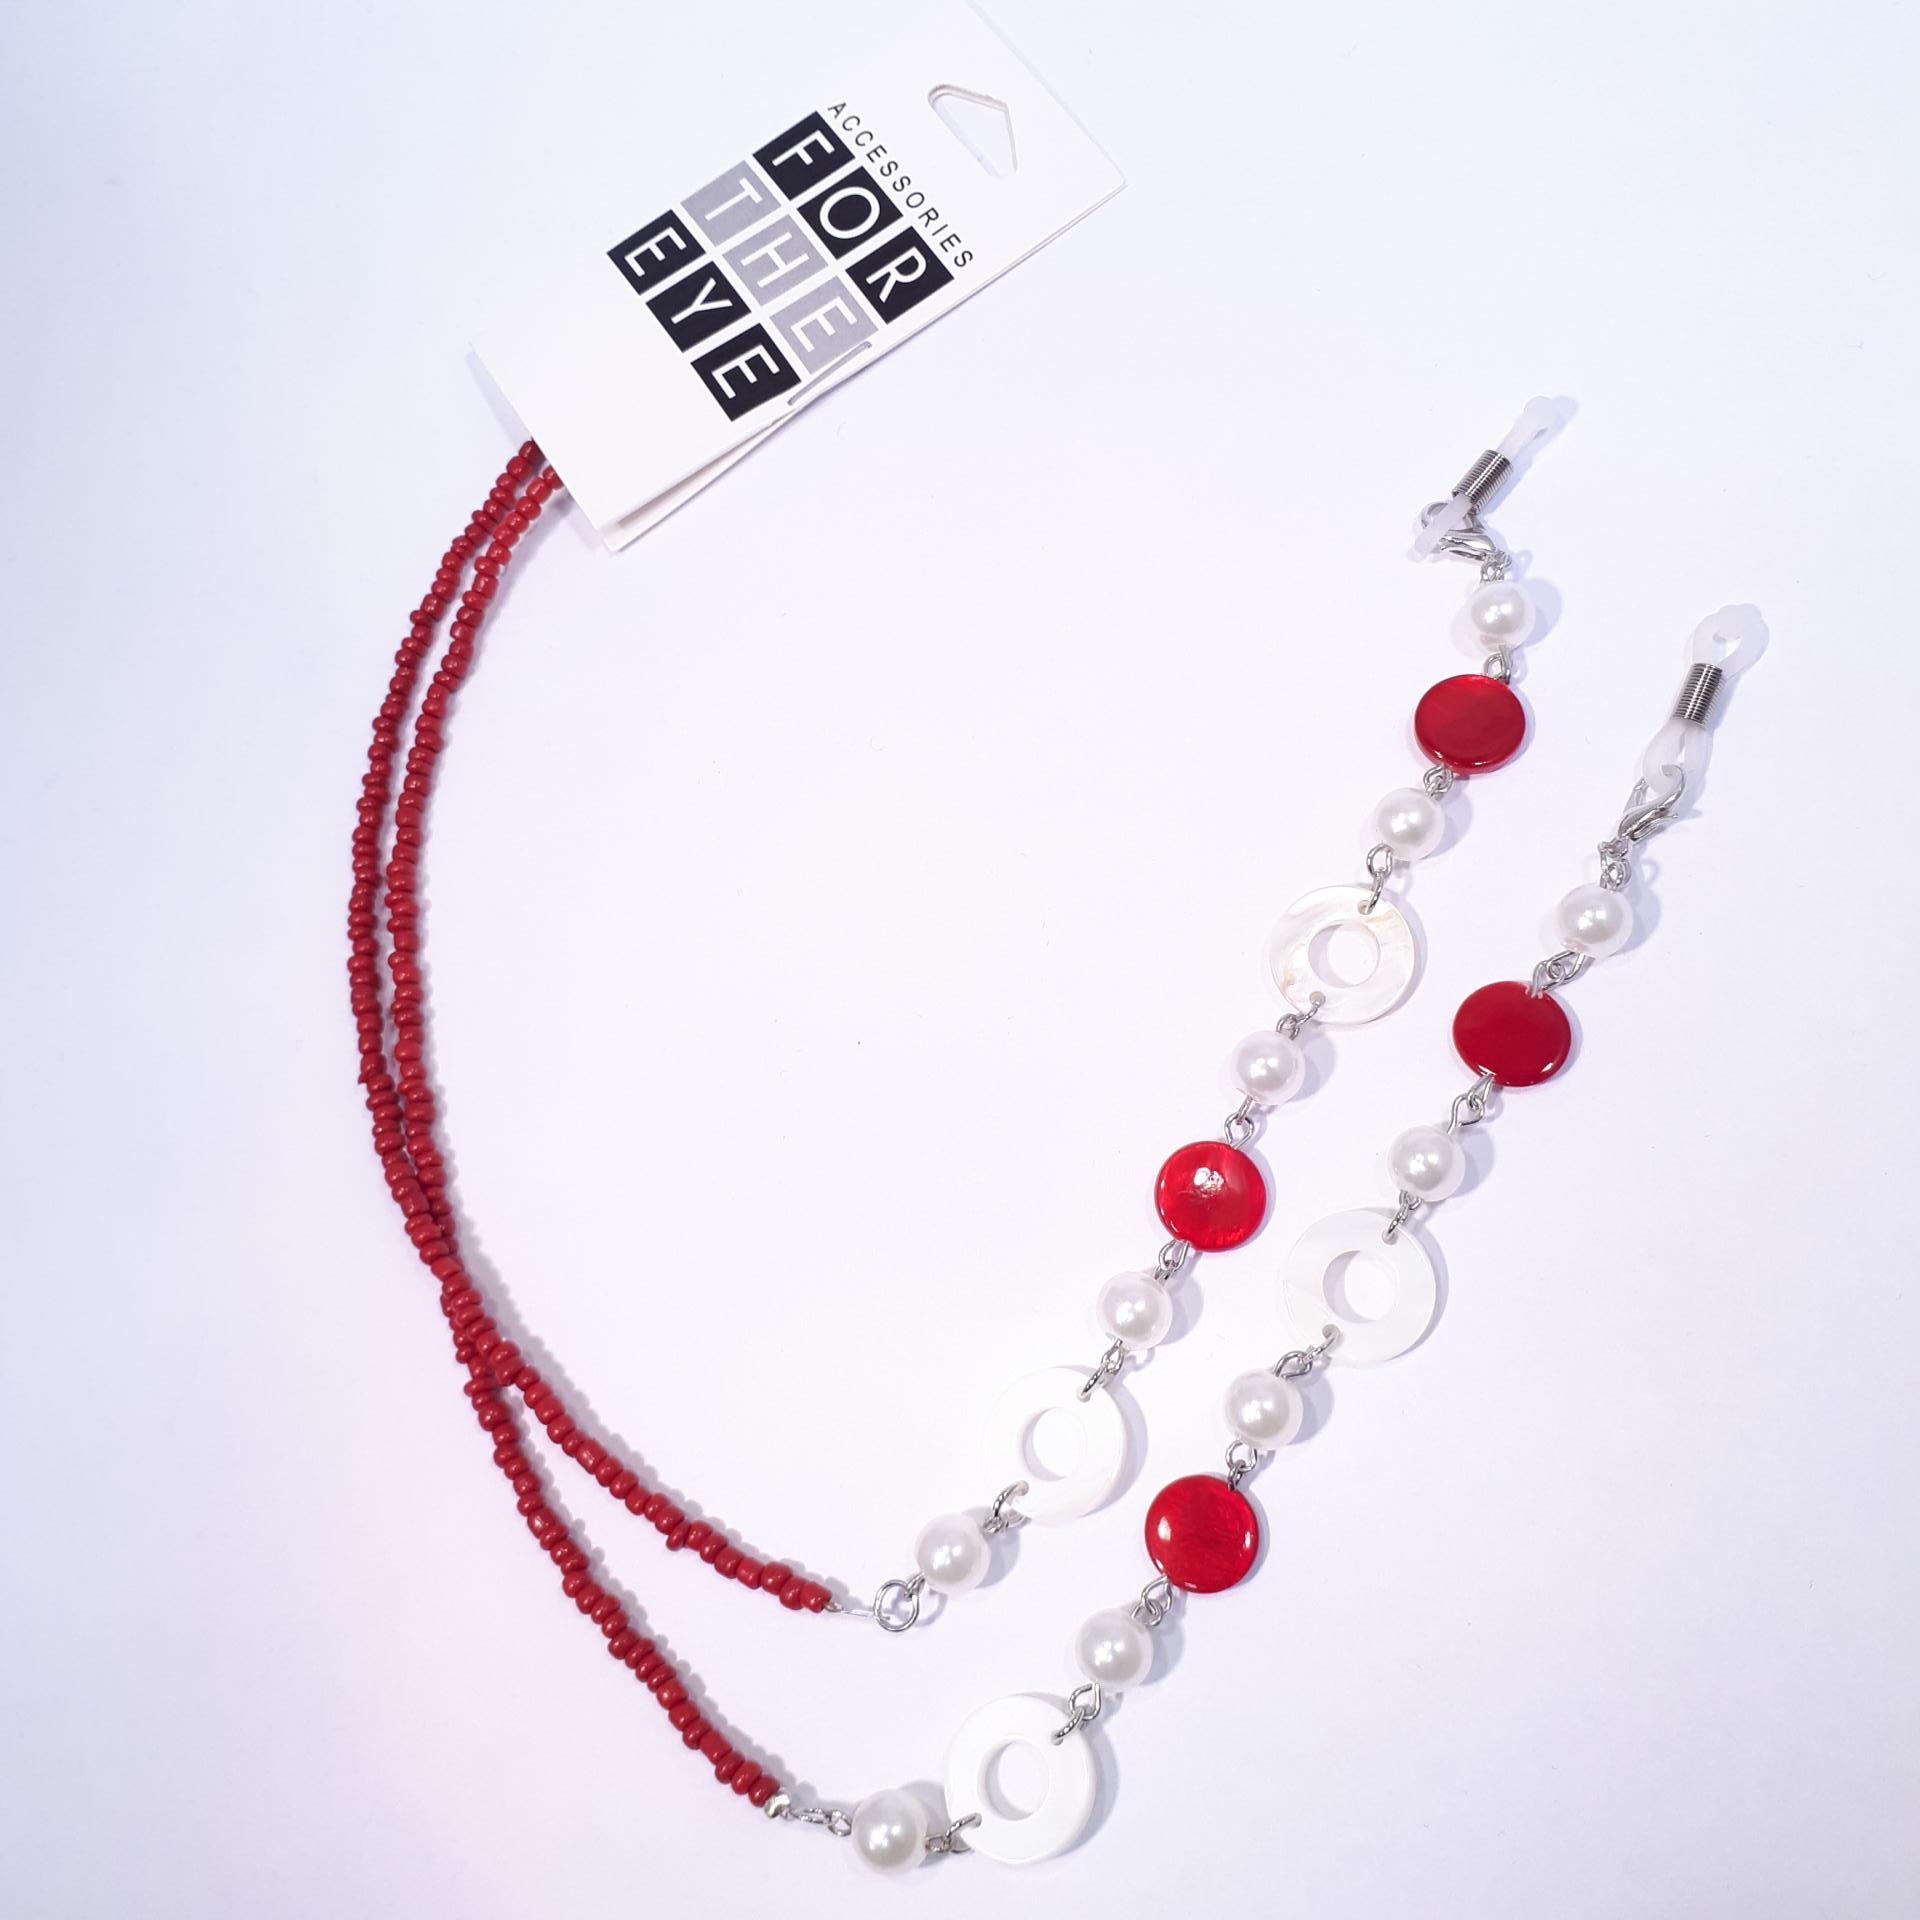 Chainettes a lunettes perles rouges